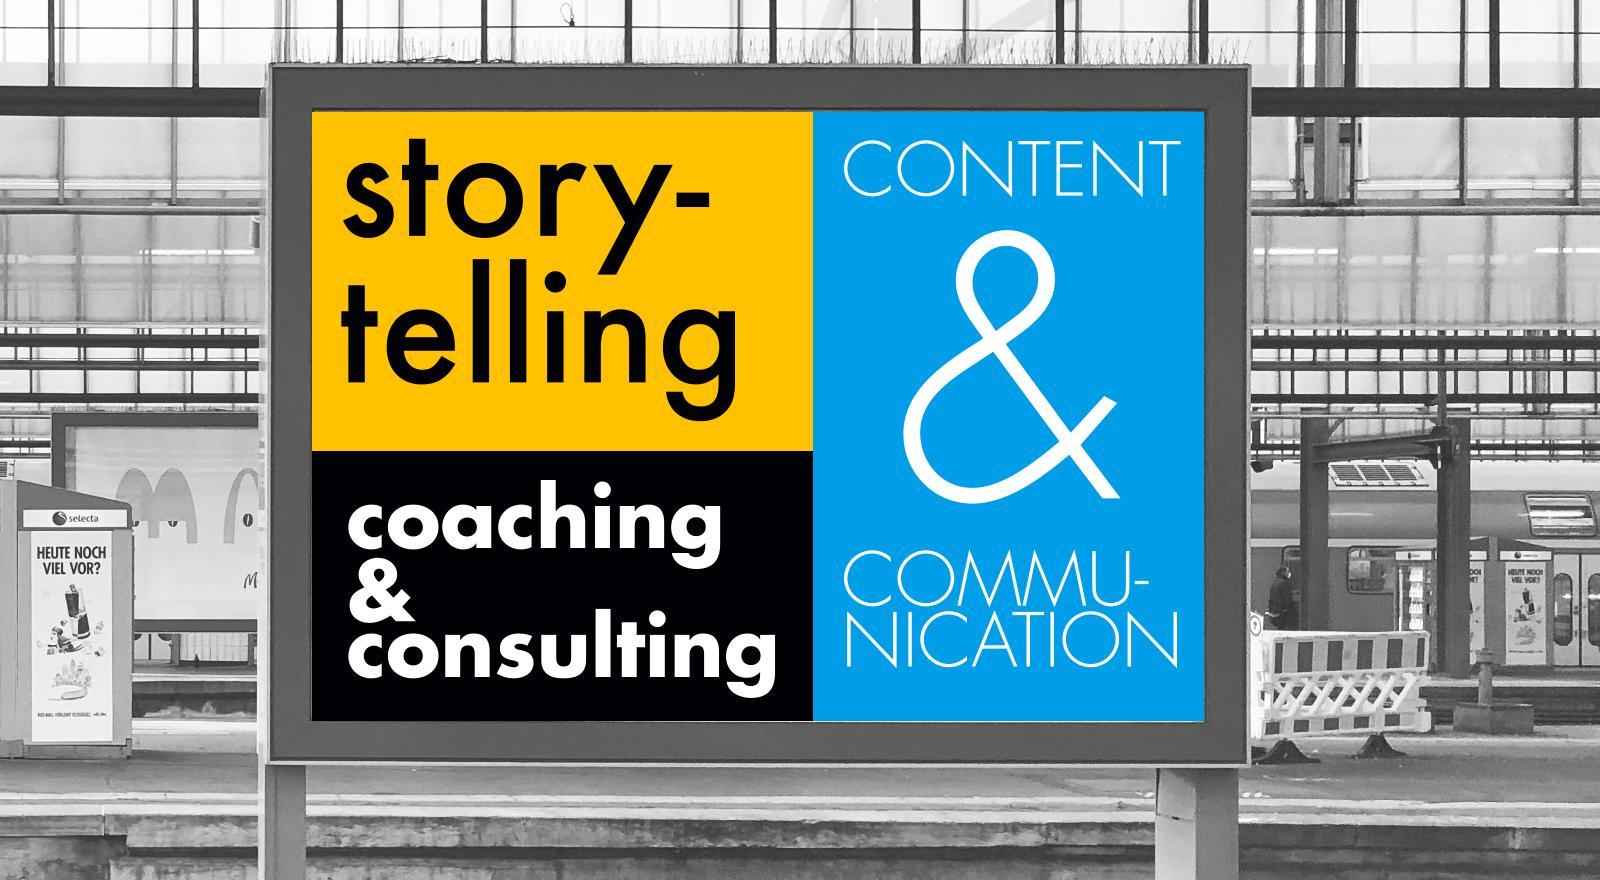 ich biete: Leistungen: Storytelling, Content, Communication, Coaching, Consulting, Trainings